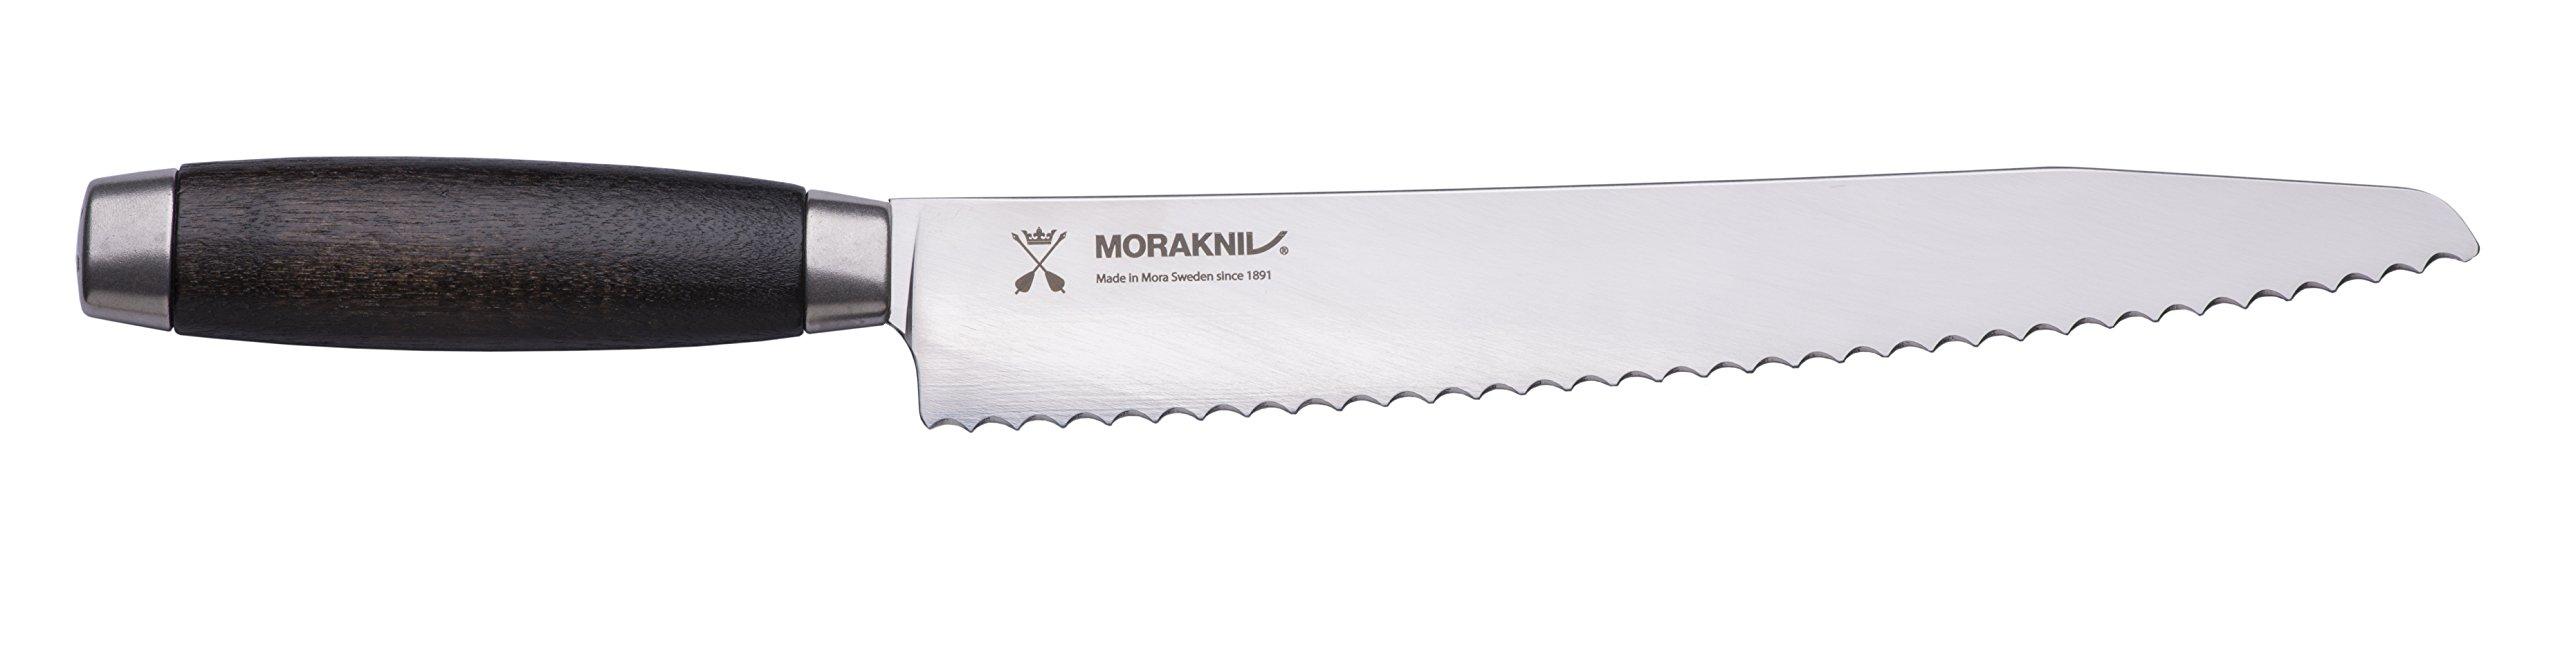 Morakniv Classic 1891 Bread Knife with Sandvik Stainless Steel Blade, 9.7 Inch, Black